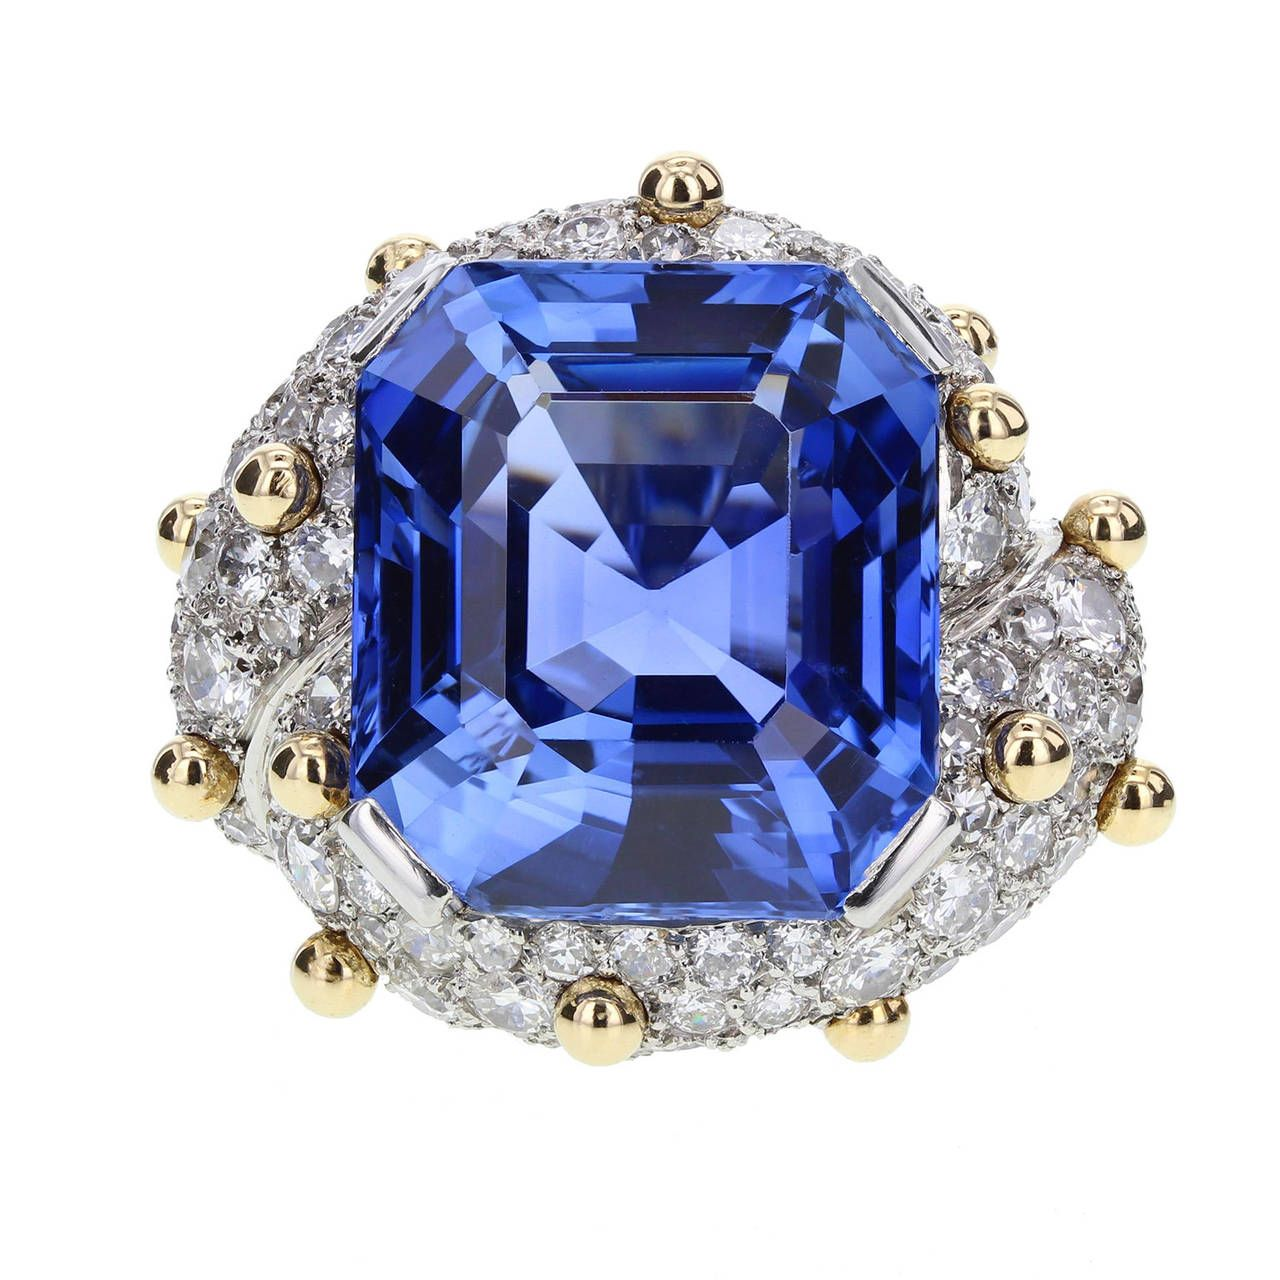 Jean Schlumberger Henri Picq Ceylon Sapphire Diamond Ring